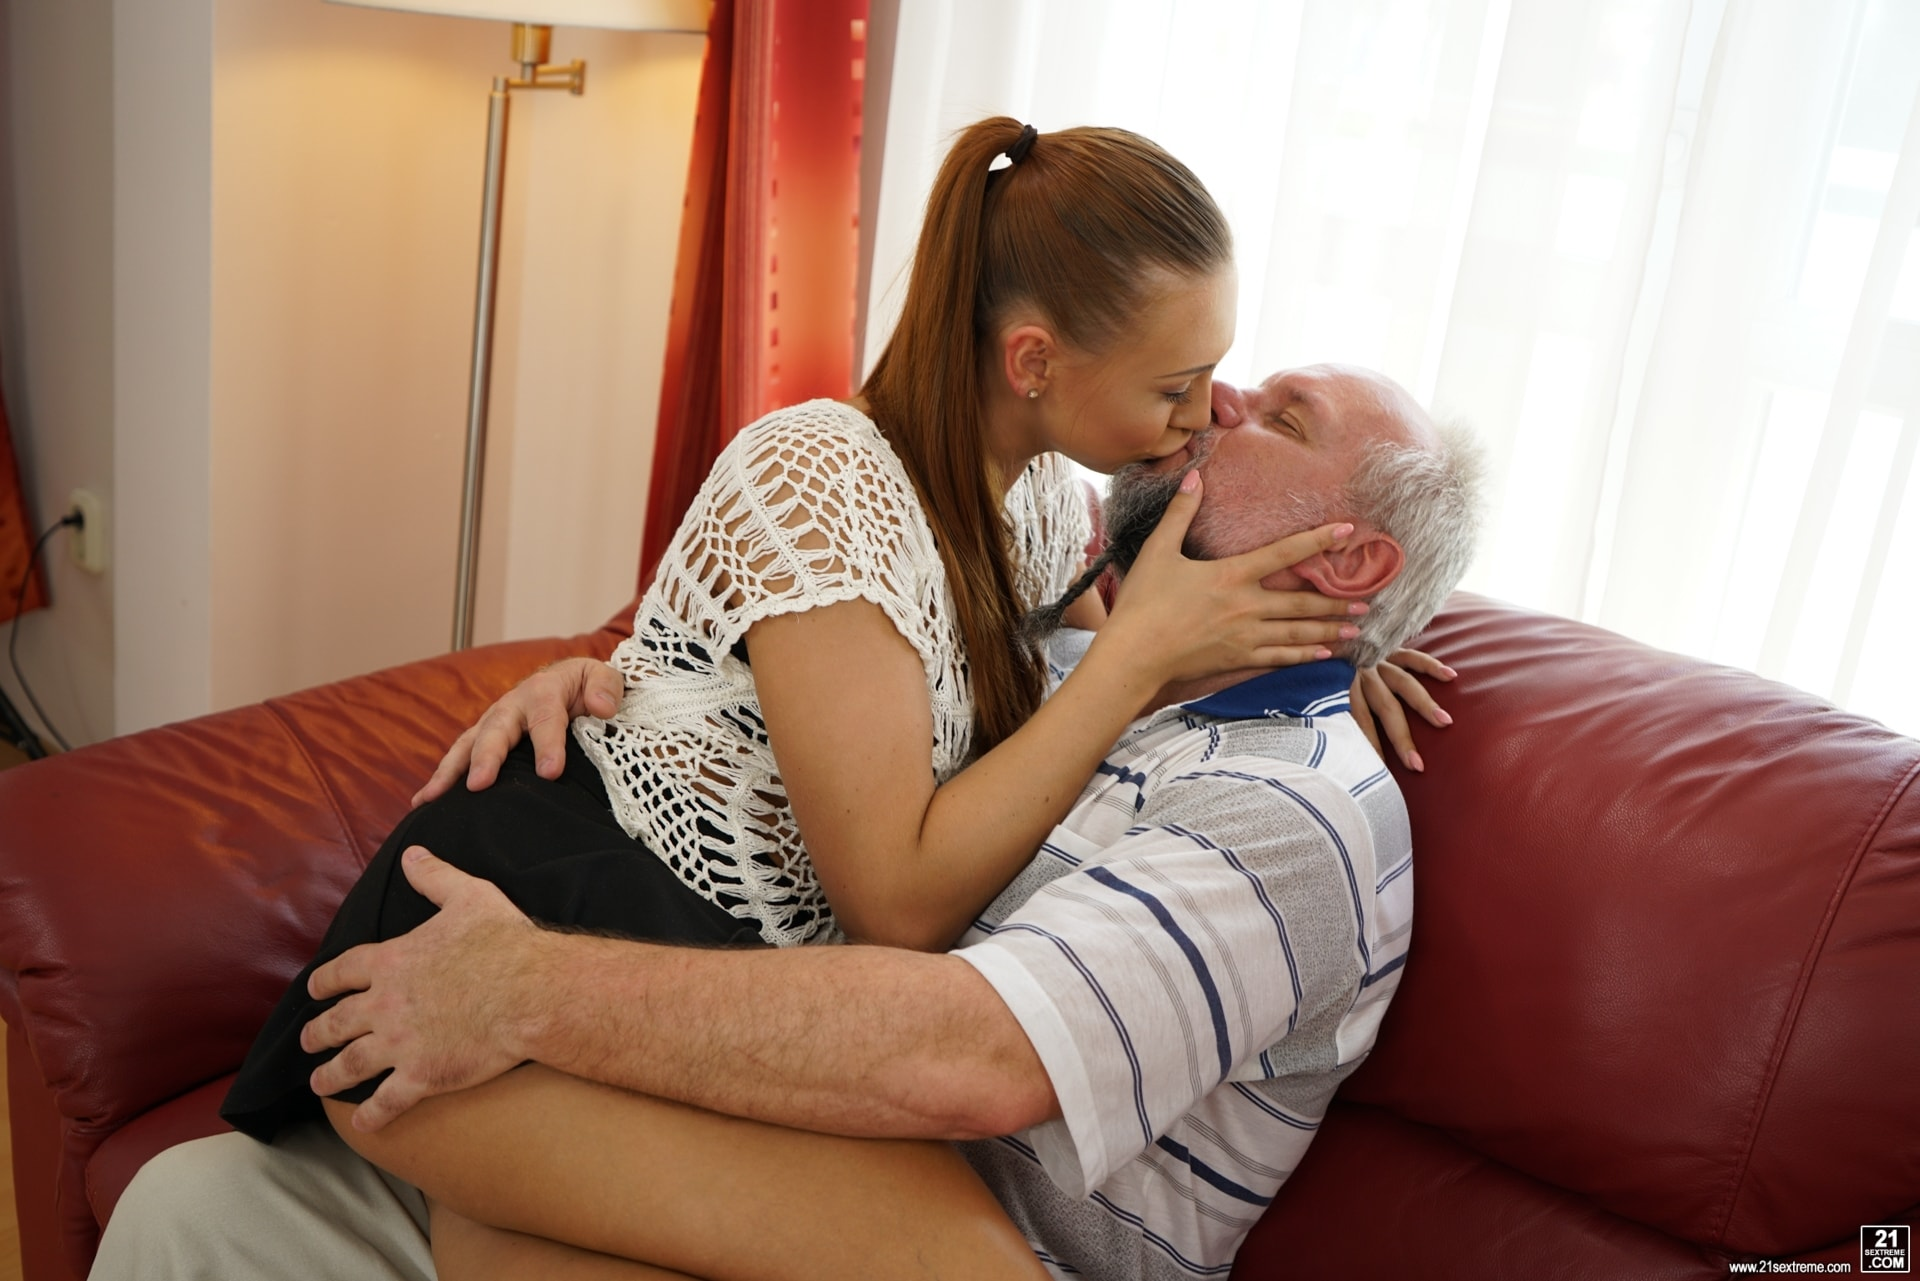 21Sextury 'Pleasing Naughty Grandpa' starring Ornella Morgan (Photo 92)